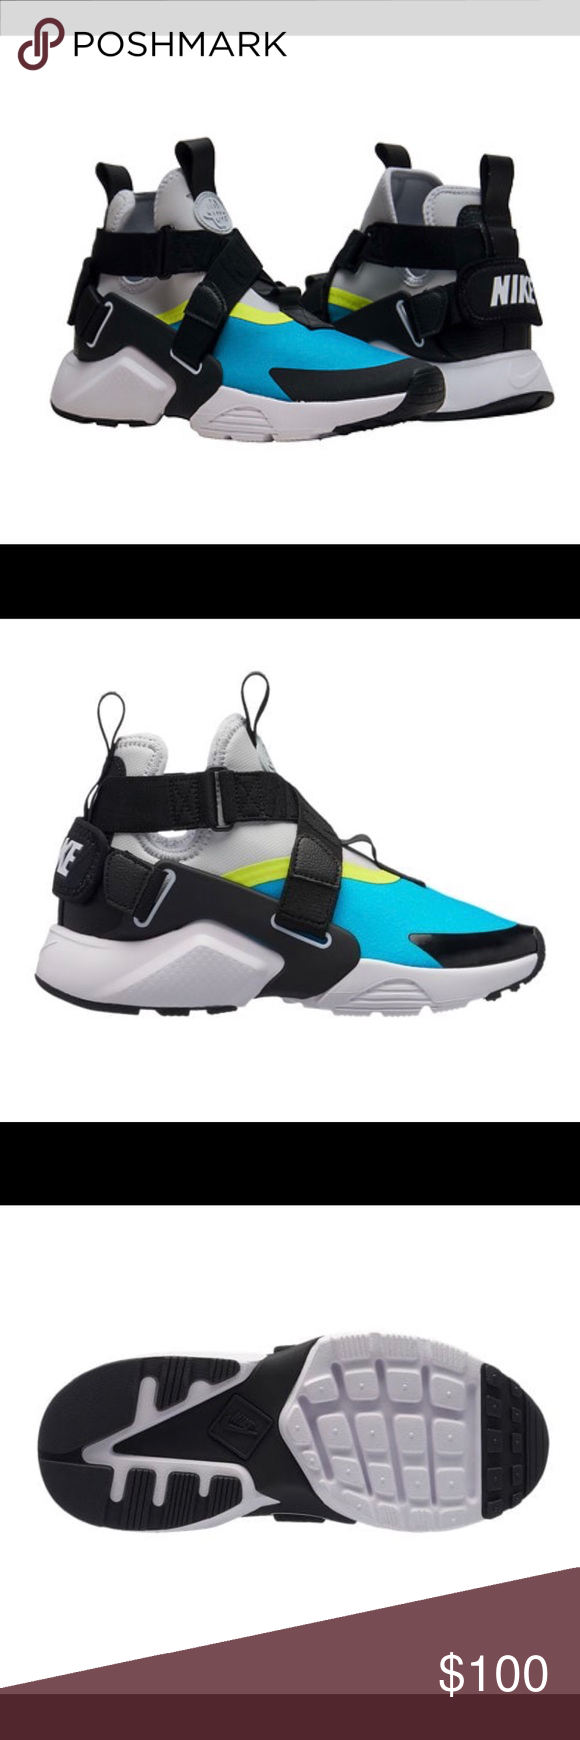 6e51d1768d0b Nike Air Huarache size 5.5Y women s 7 nike huarache city high Nike Shoes  Athletic Shoes